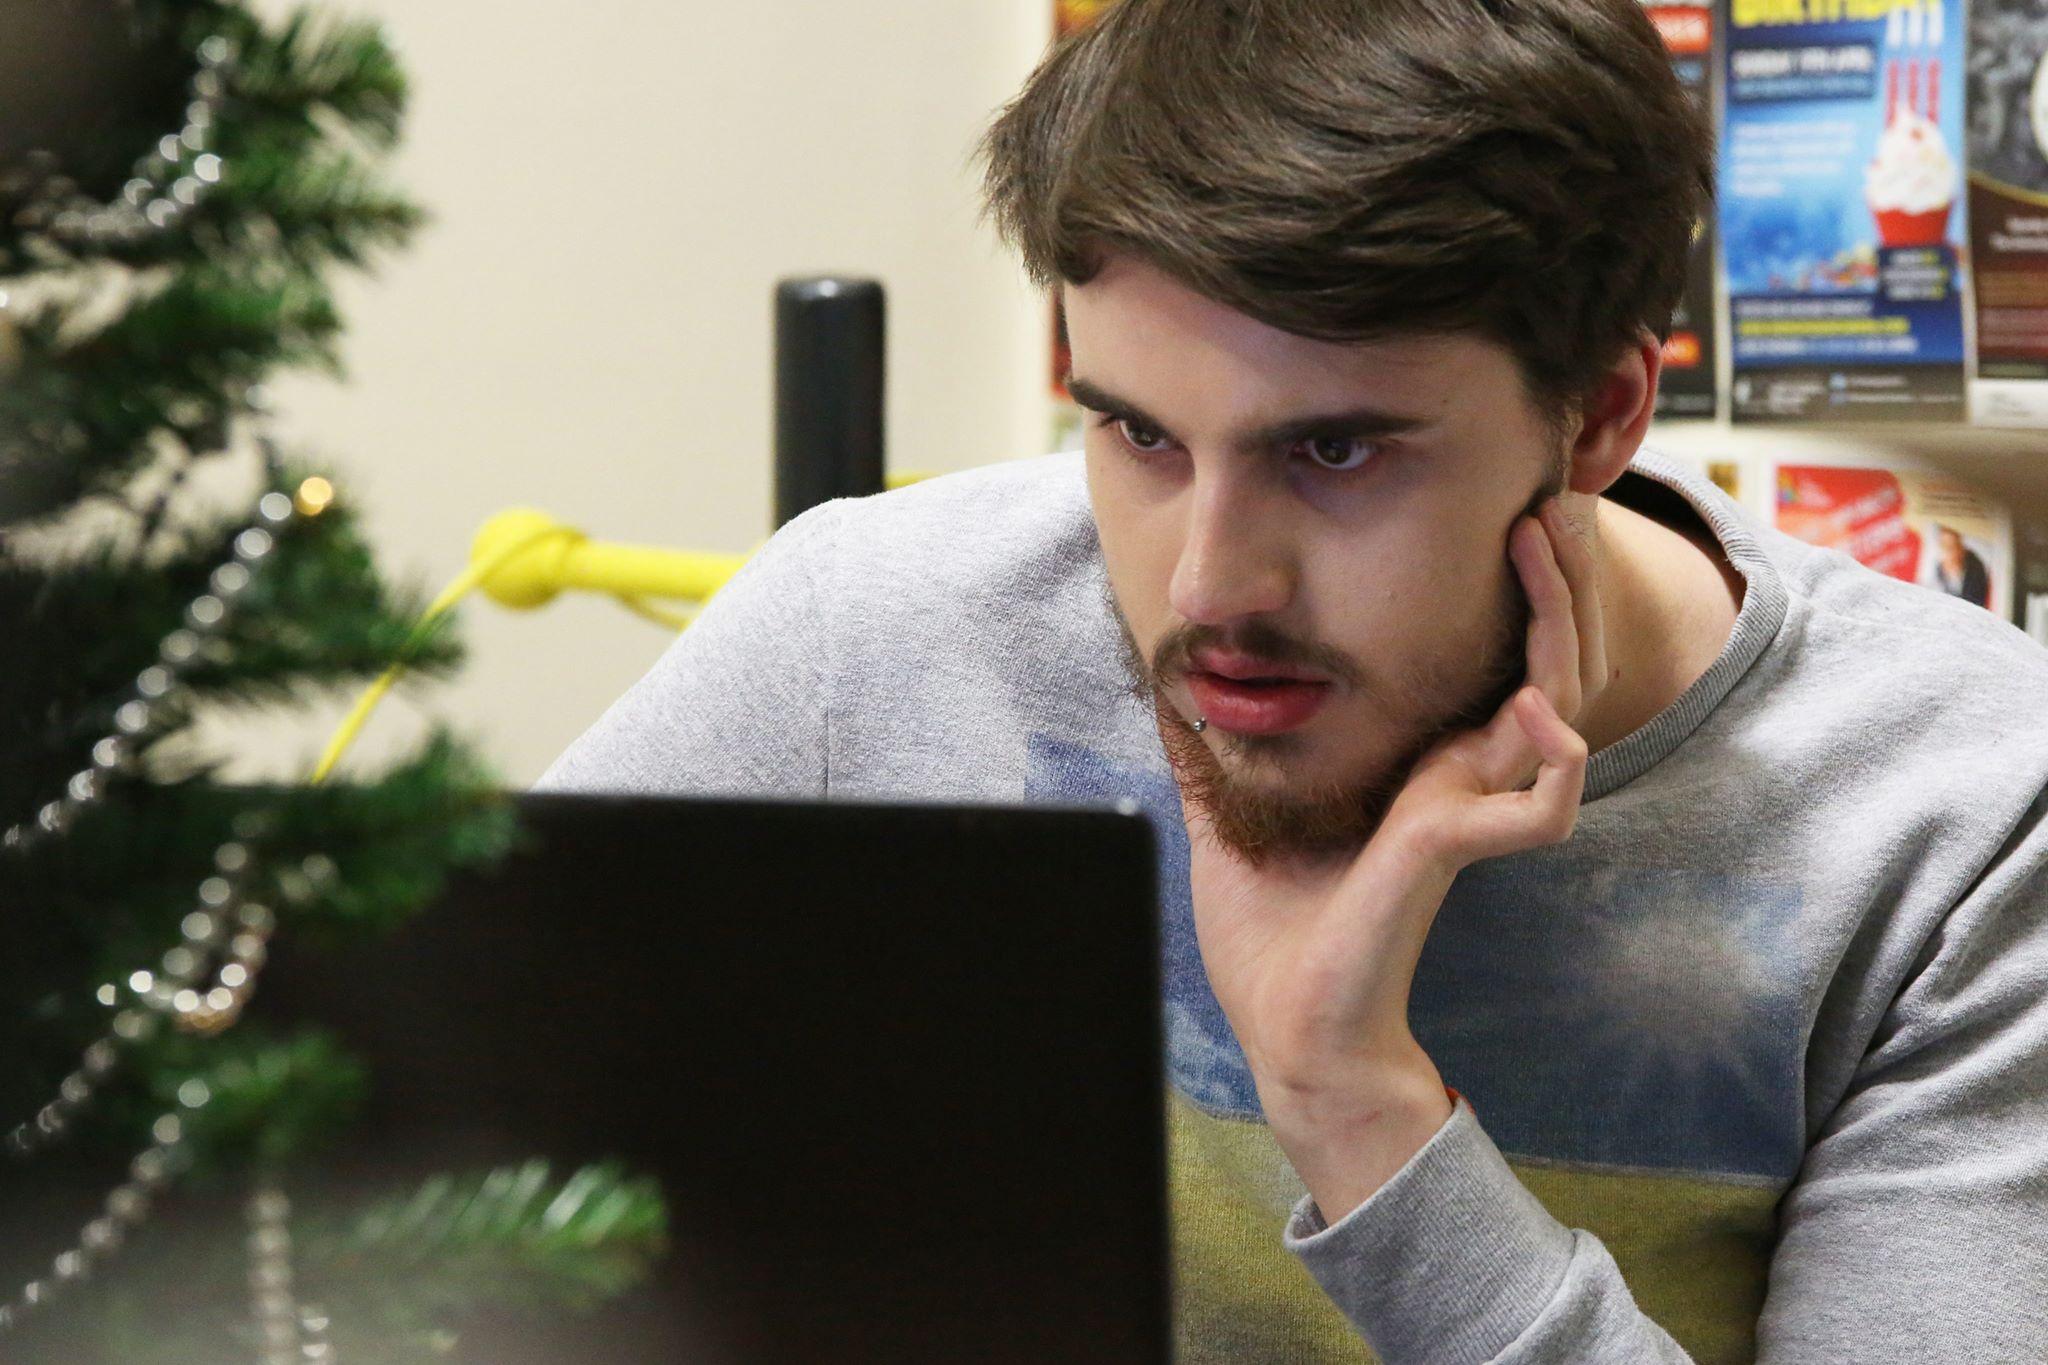 TPO helps Kickstart young accountant's career